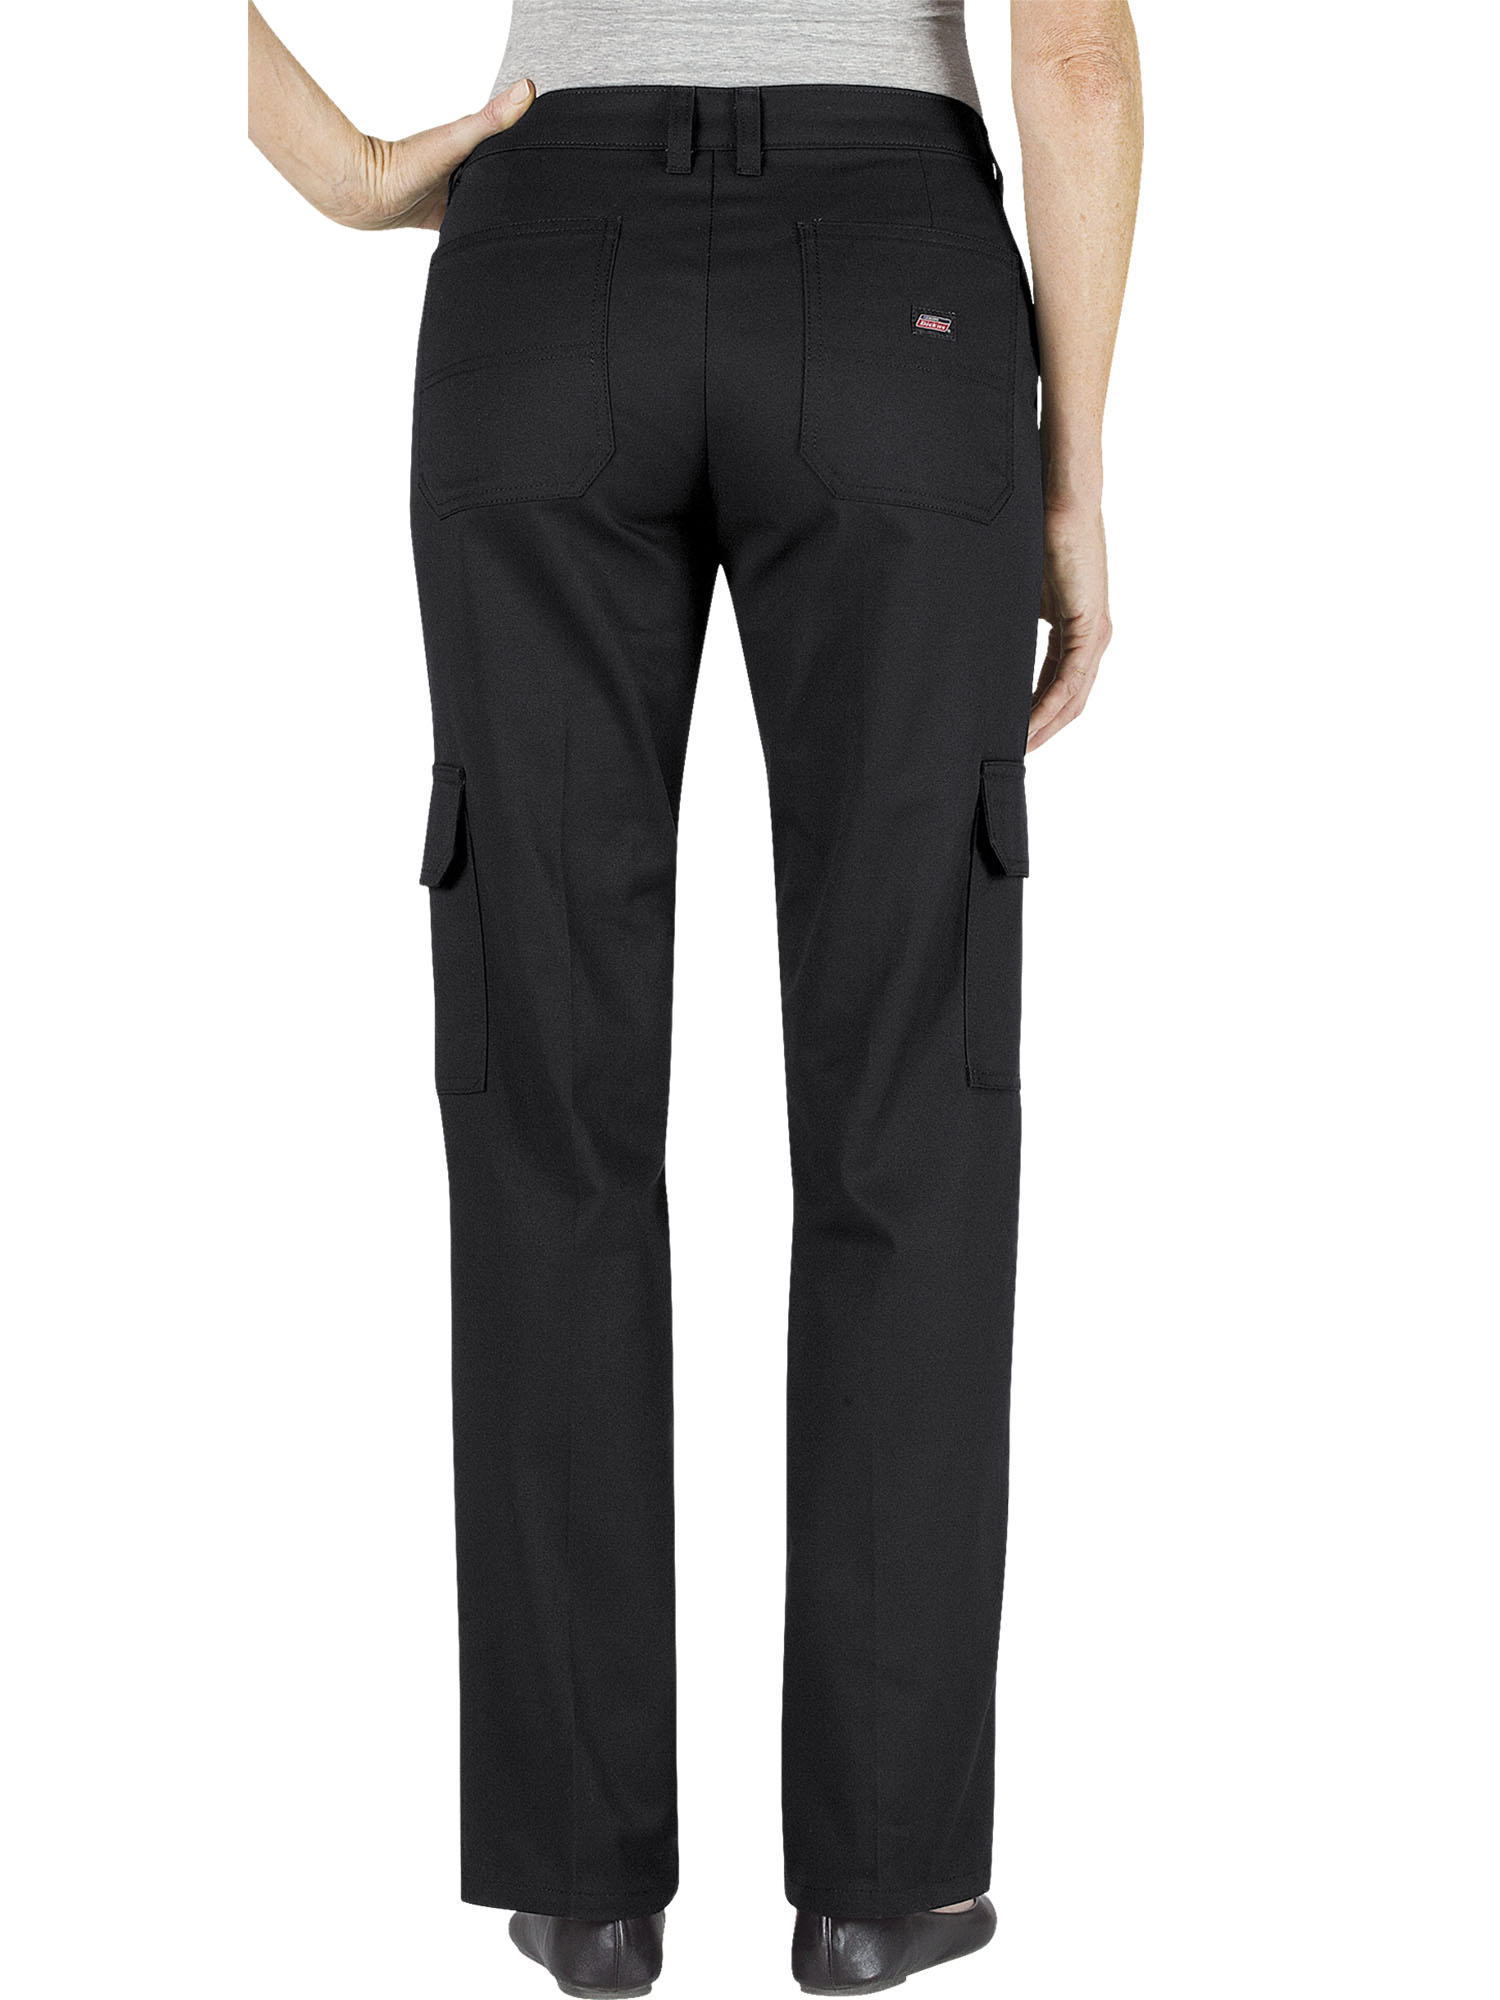 7b0e7876994 Genuine Dickies - Women s Relaxed Fit Straight Leg Cargo Pant - Walmart.com